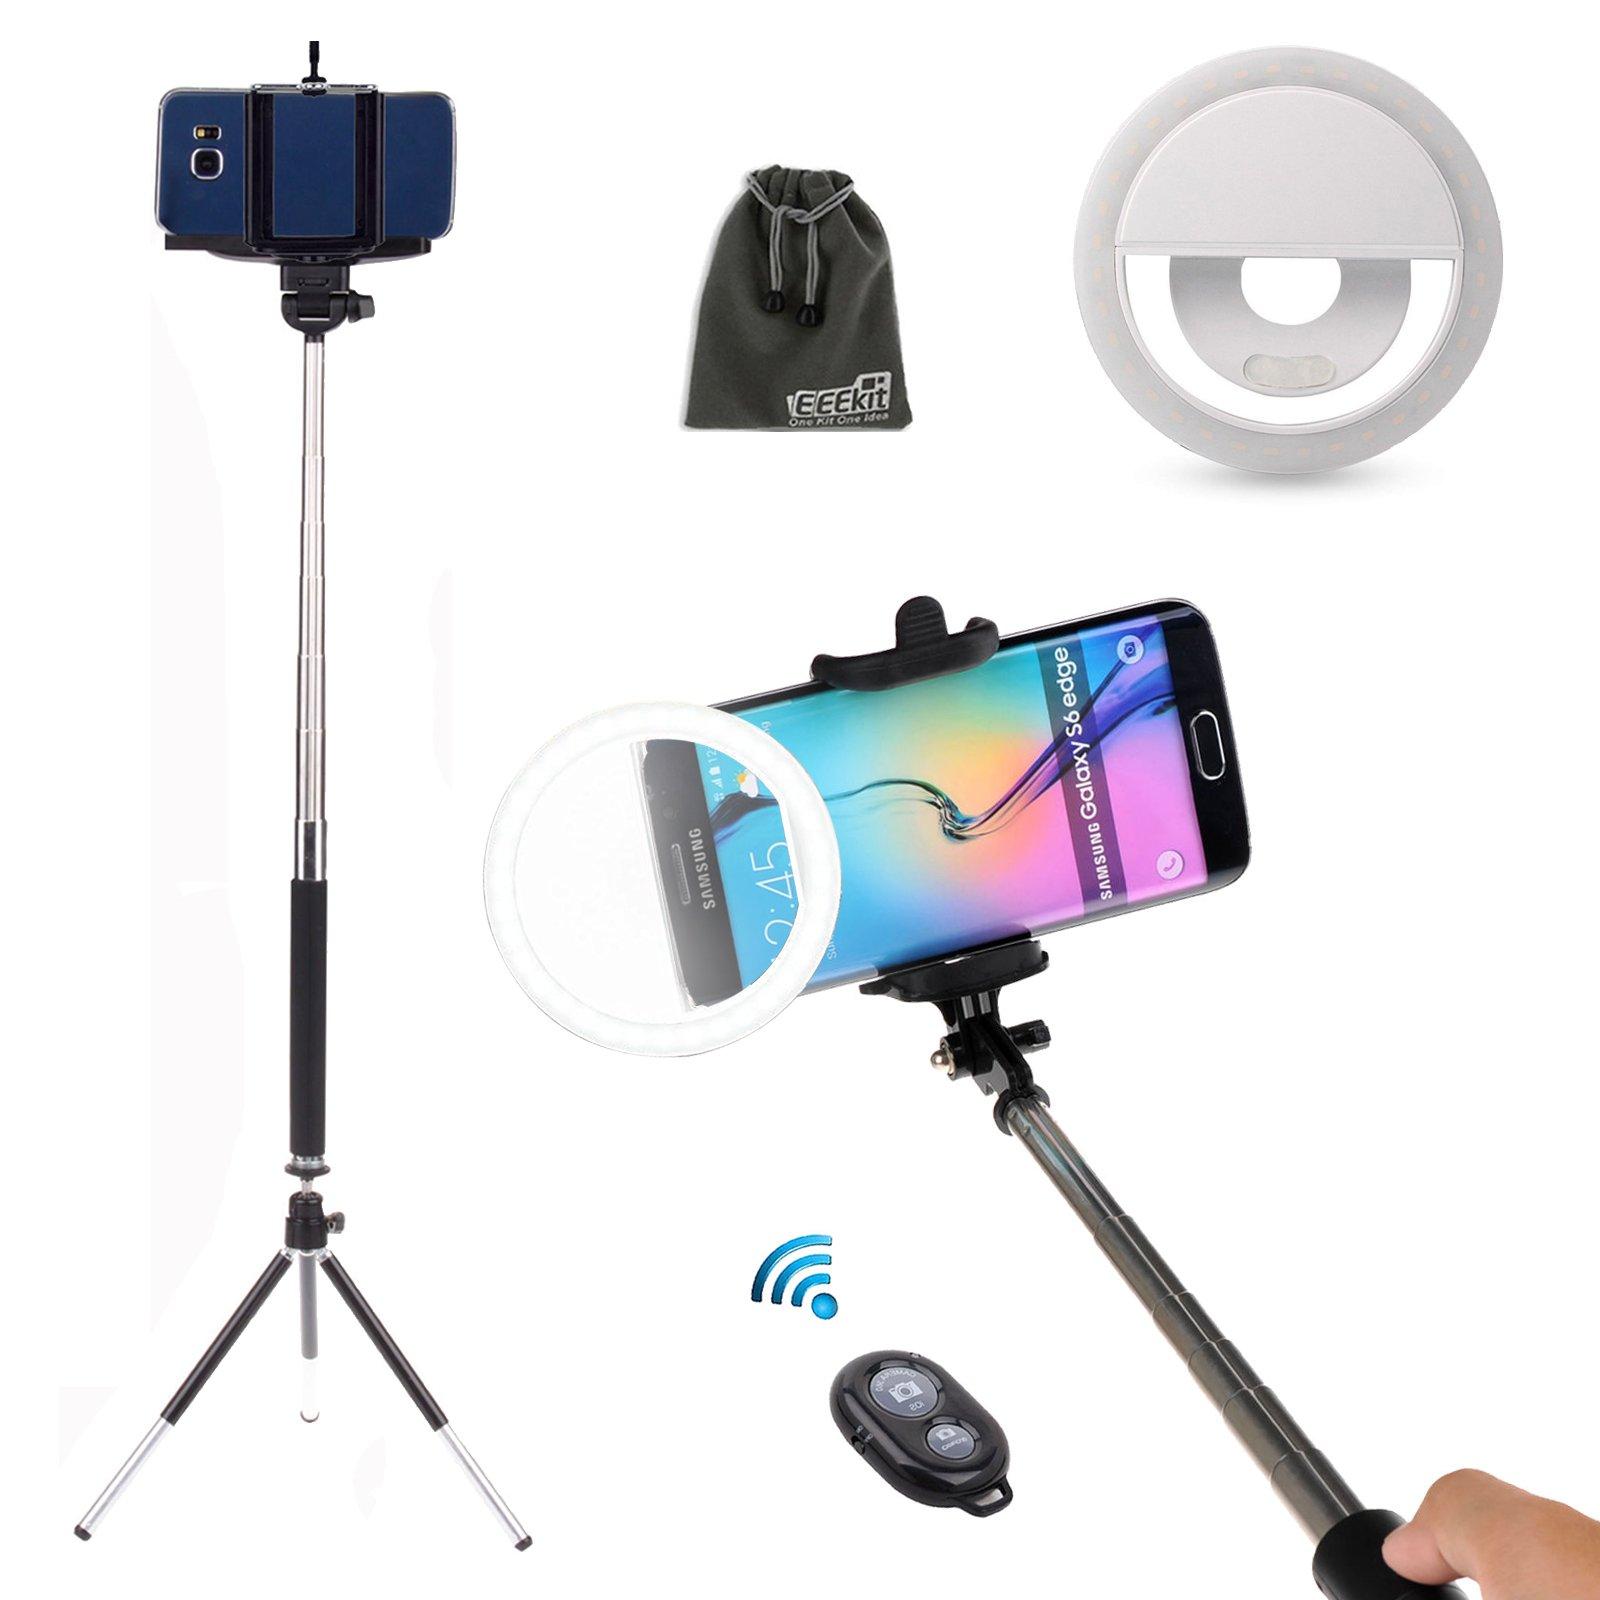 EEEKit 5in1 Selfie Kit for Samsung Galaxy Note 9 8 iPhone X 8/8 Plus, Selfie Stick Pole Monopod, Ring Fill Light Up Flash Luminous LED, Mini Tripod Stand, Mini Remote Control